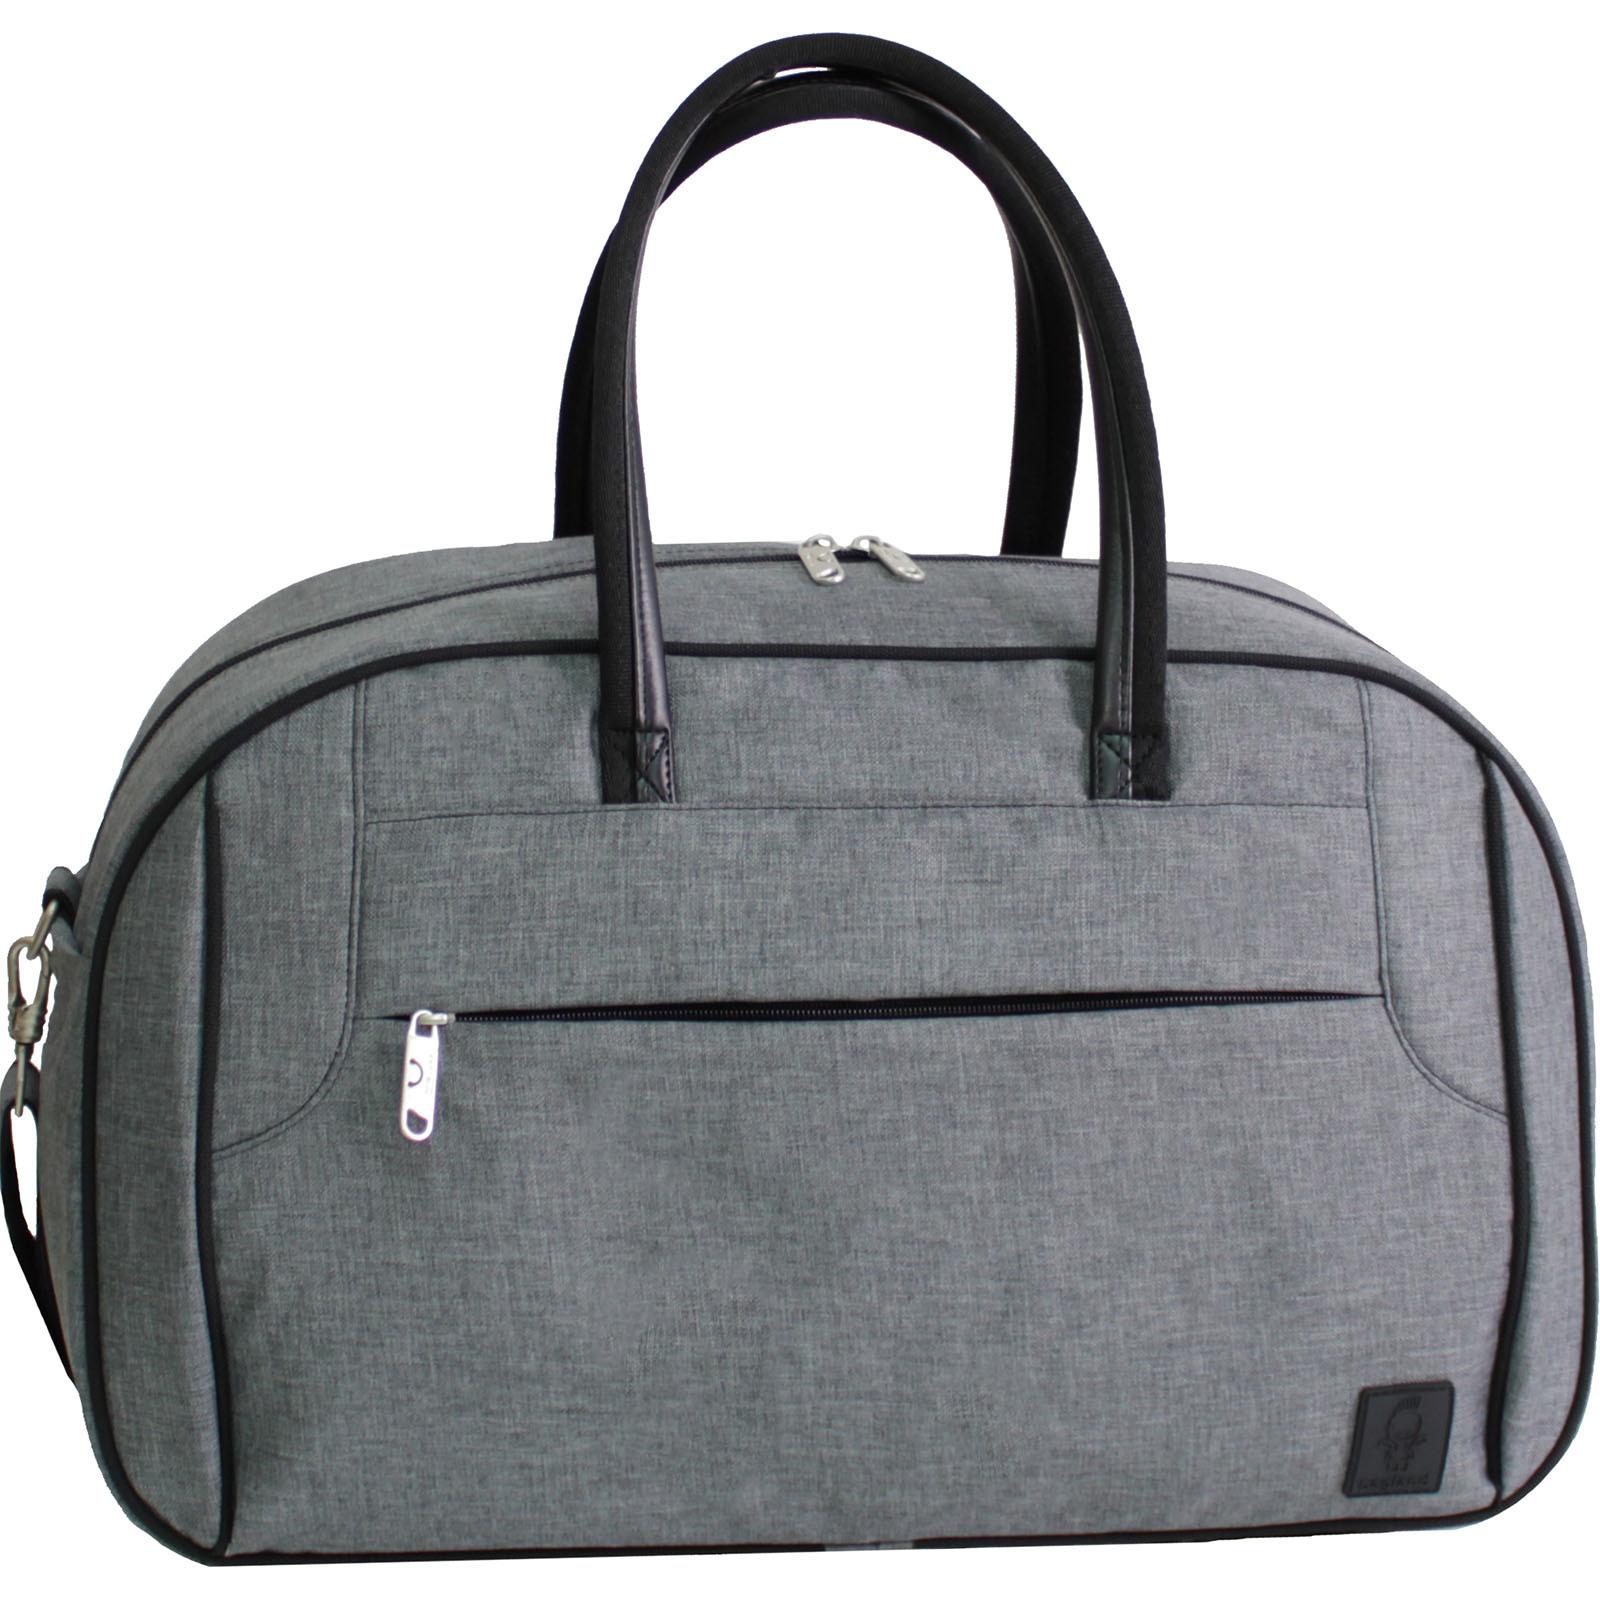 Спортивные сумки Сумка Bagland Тунис 34 л. Серый (0039069) IMG_9141.JPG